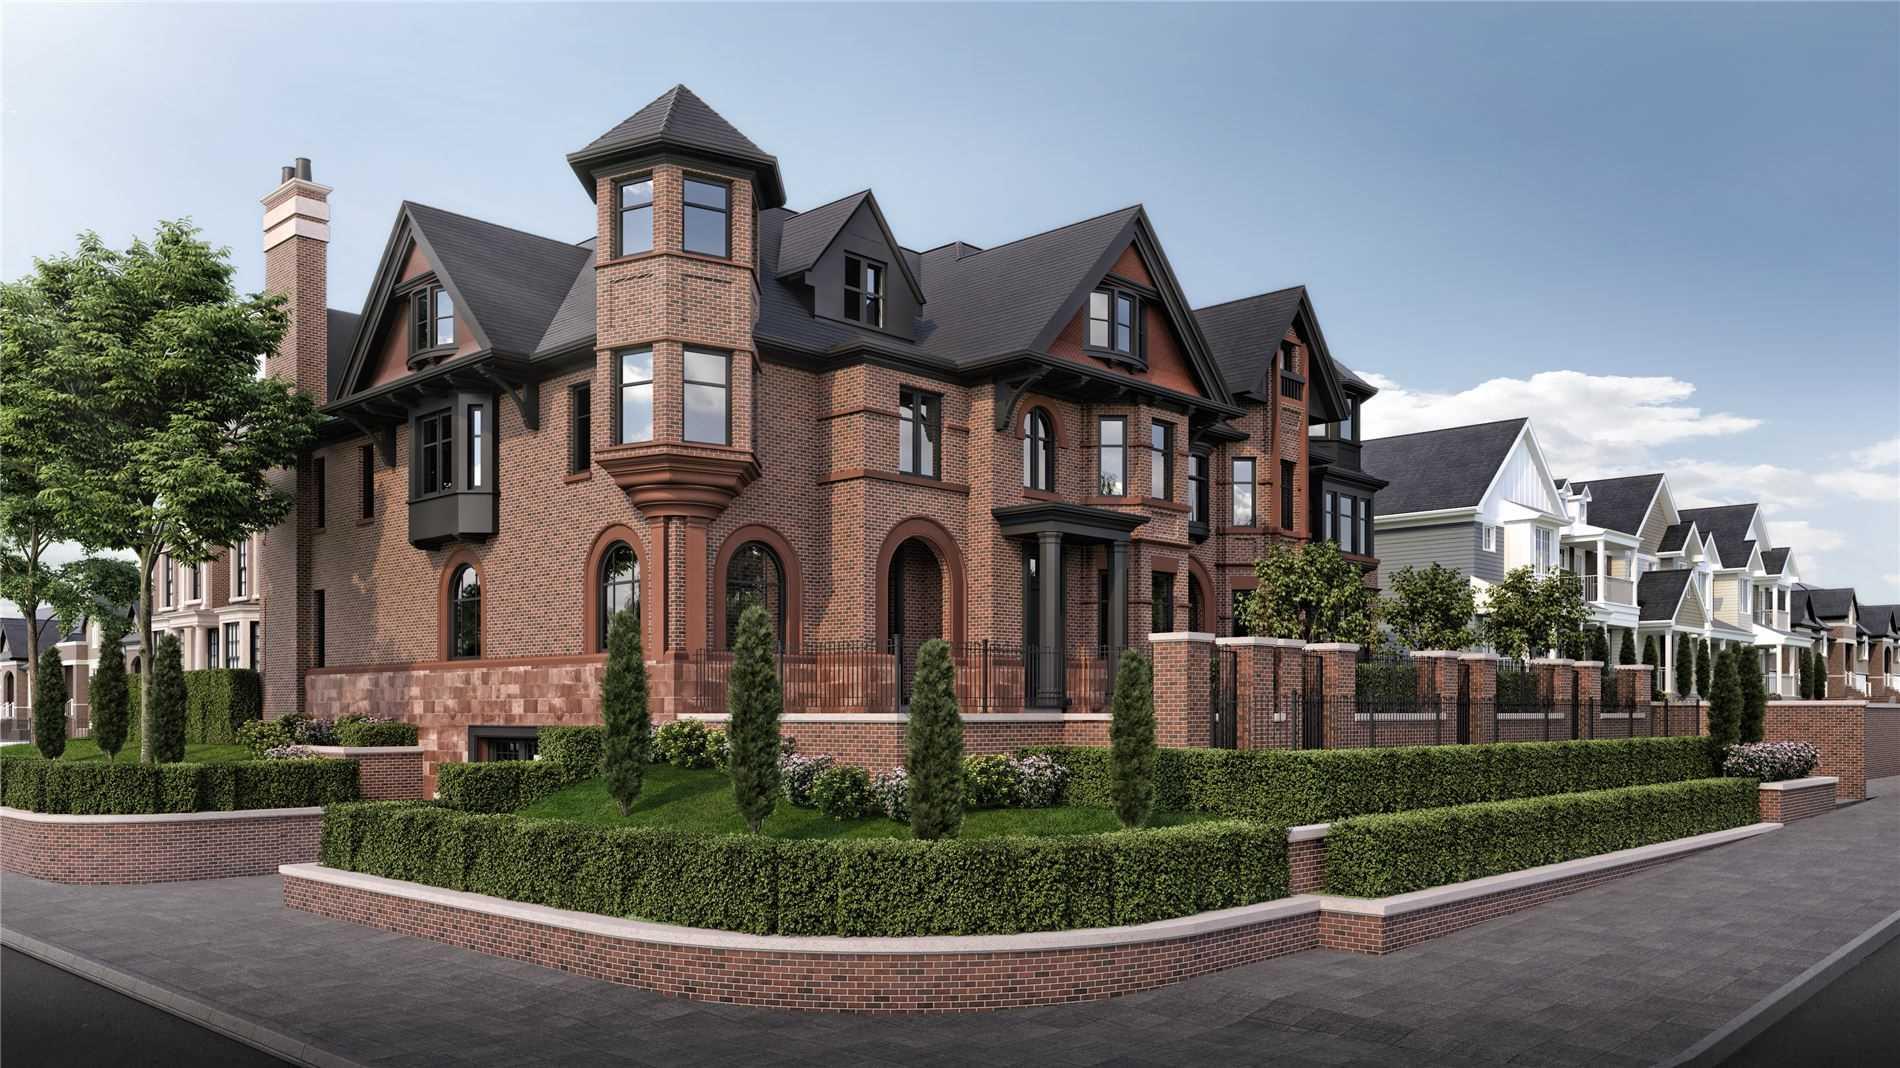 377 Spadina Rd, Toronto, Ontario M5P2V7, 4 Bedrooms Bedrooms, 9 Rooms Rooms,5 BathroomsBathrooms,Att/Row/Twnhouse,For Sale,Spadina,C5191911